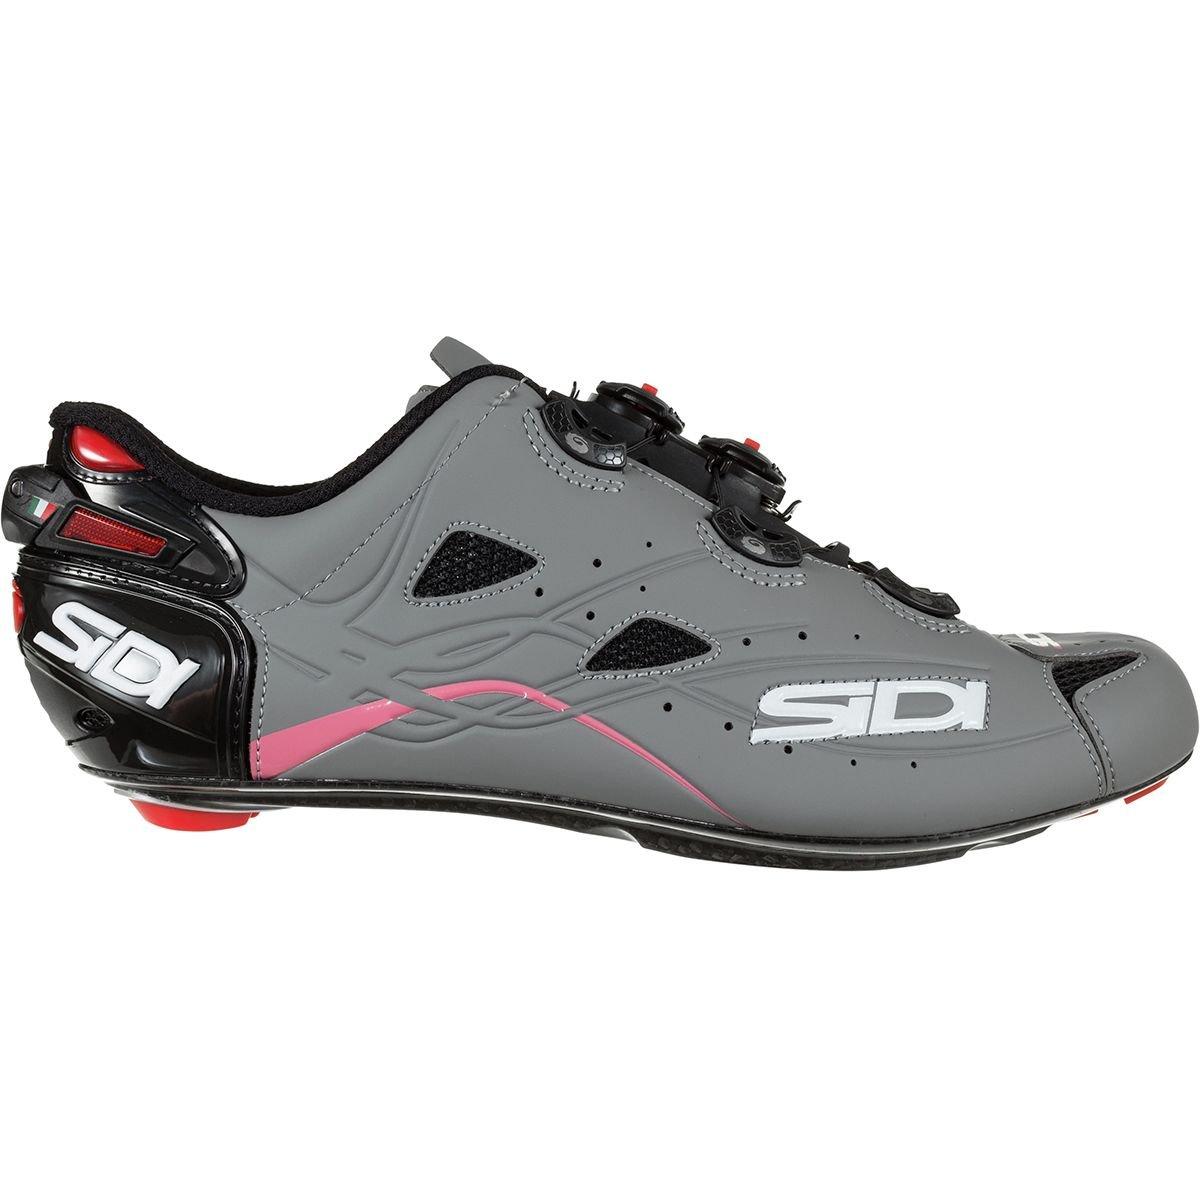 [Sidi] メンズ SRS-SOT-GI18-425 B07D9TGXNS 46.5 EU|Black/Grey/Pink Black/Grey/Pink 46.5 EU